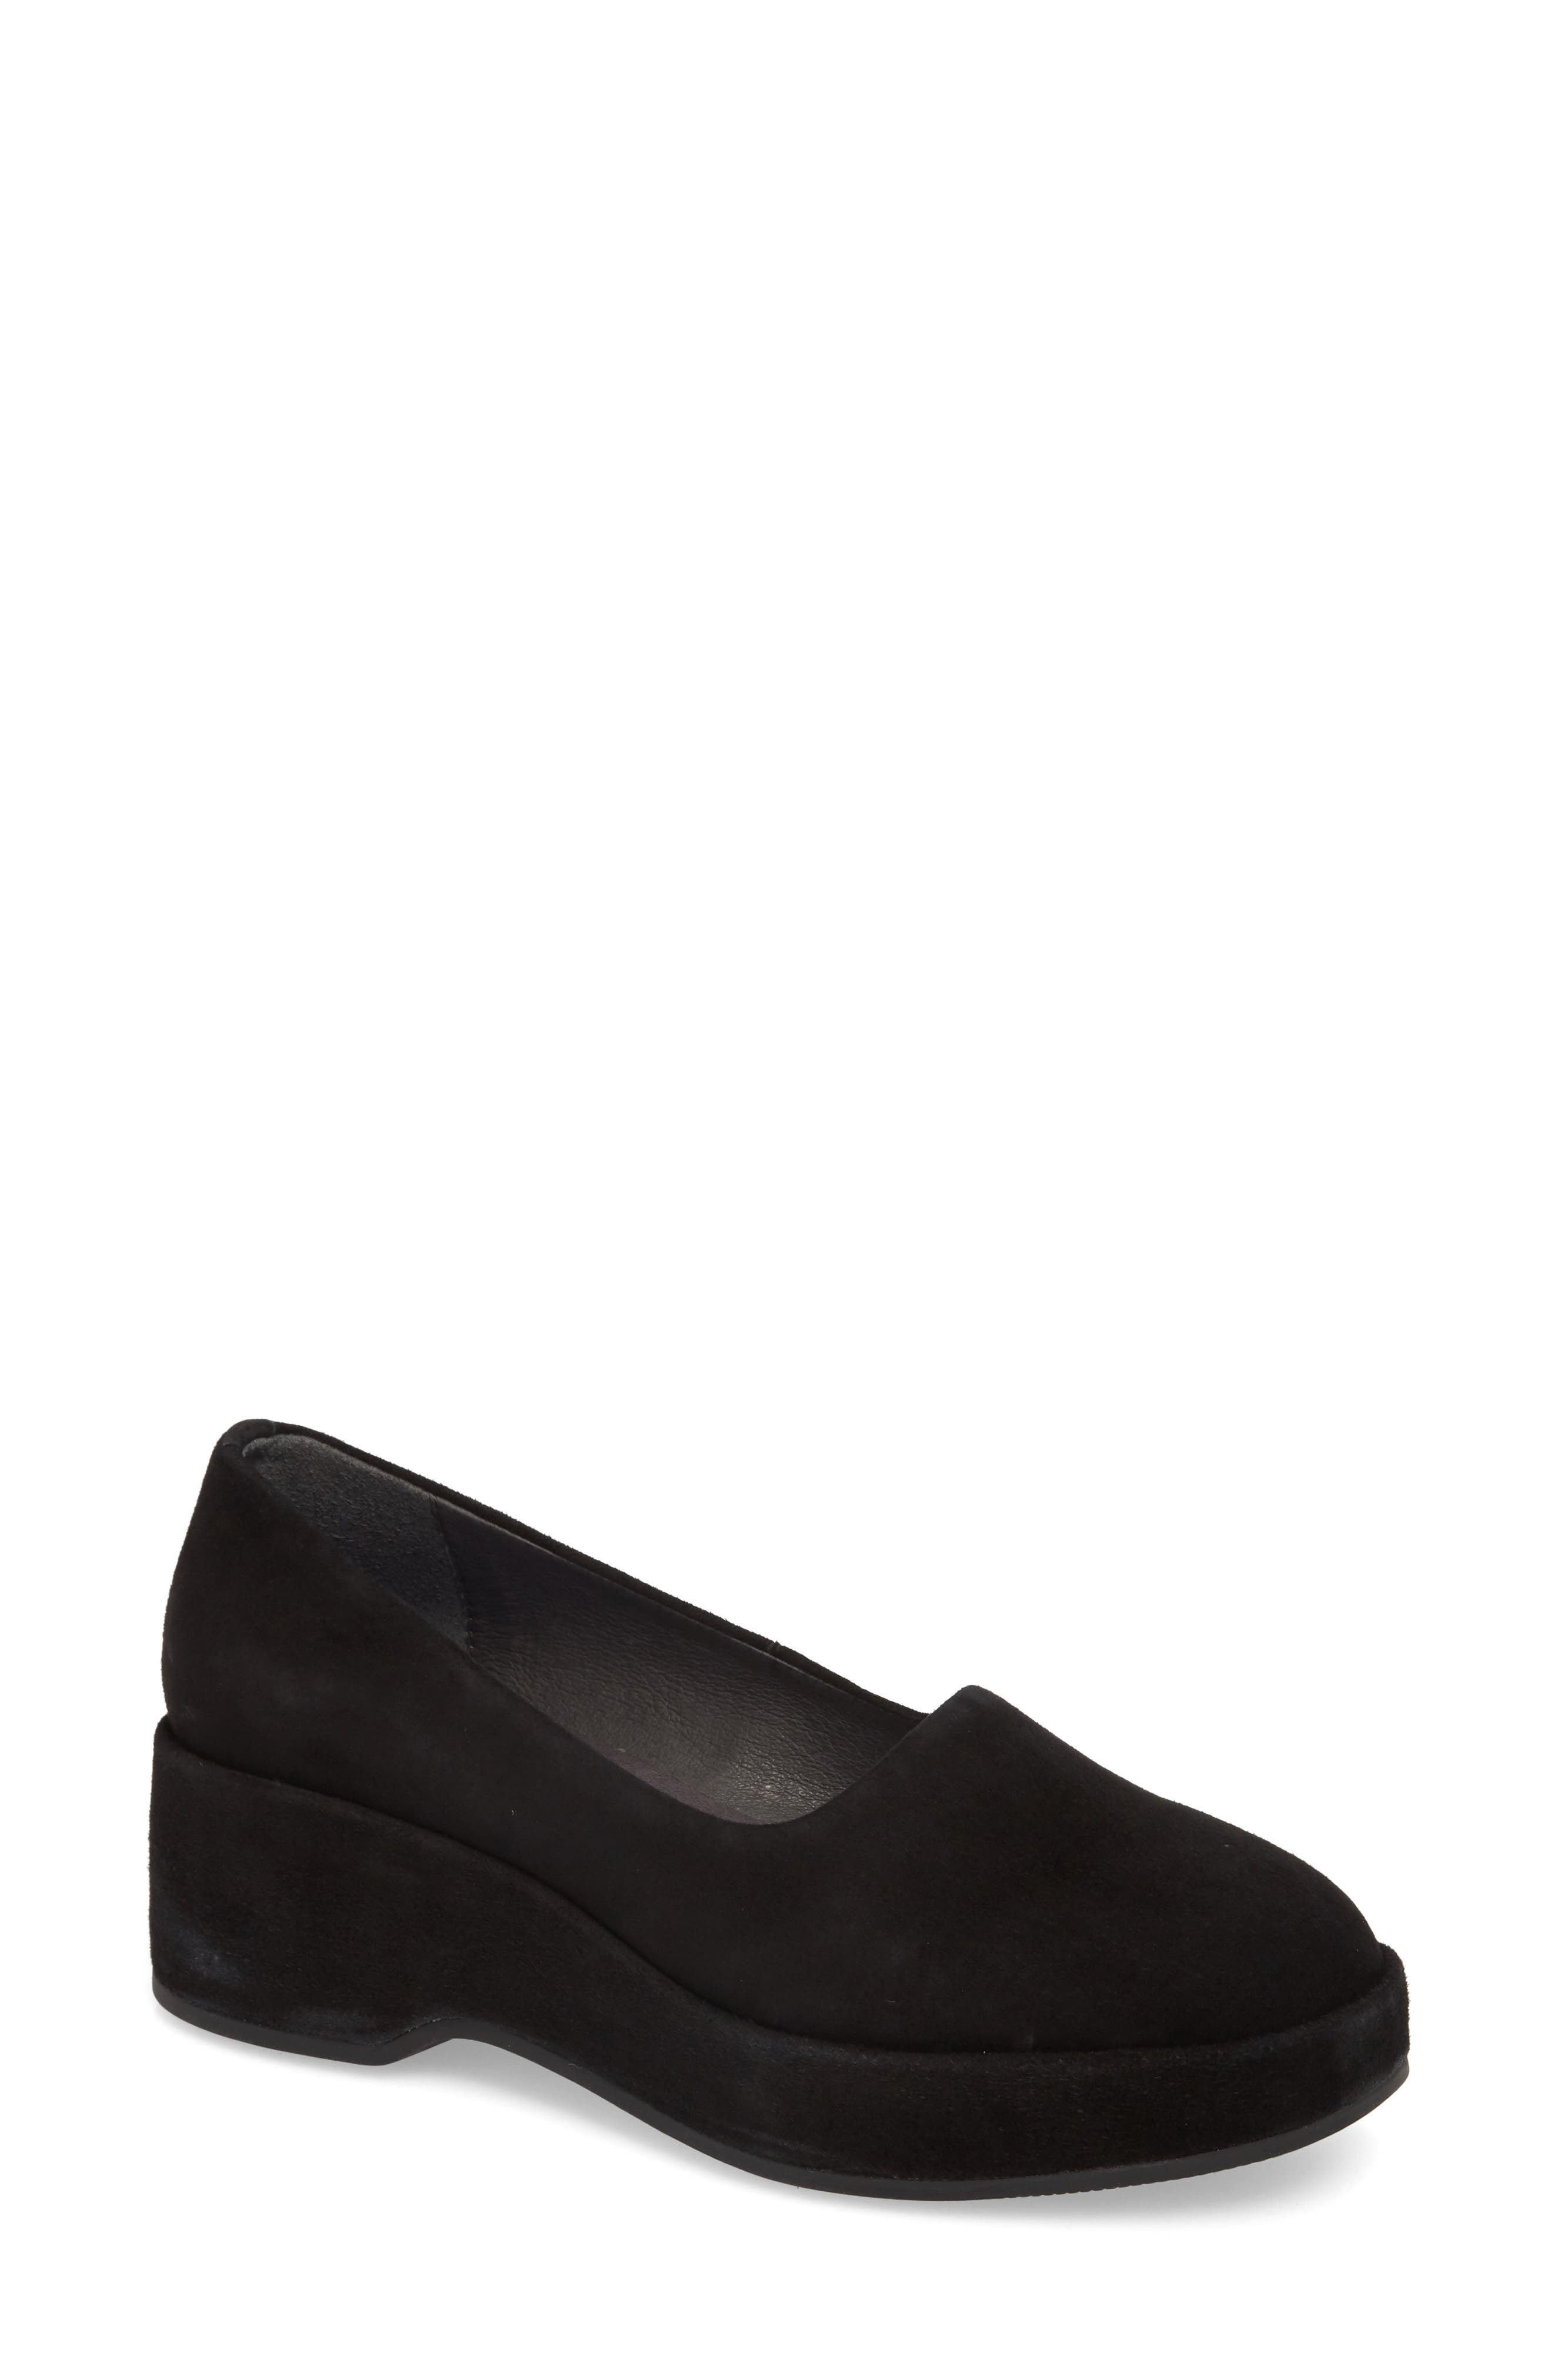 Sisea Platform Shoe,                             Main thumbnail 1, color,                             BLACK LEATHER